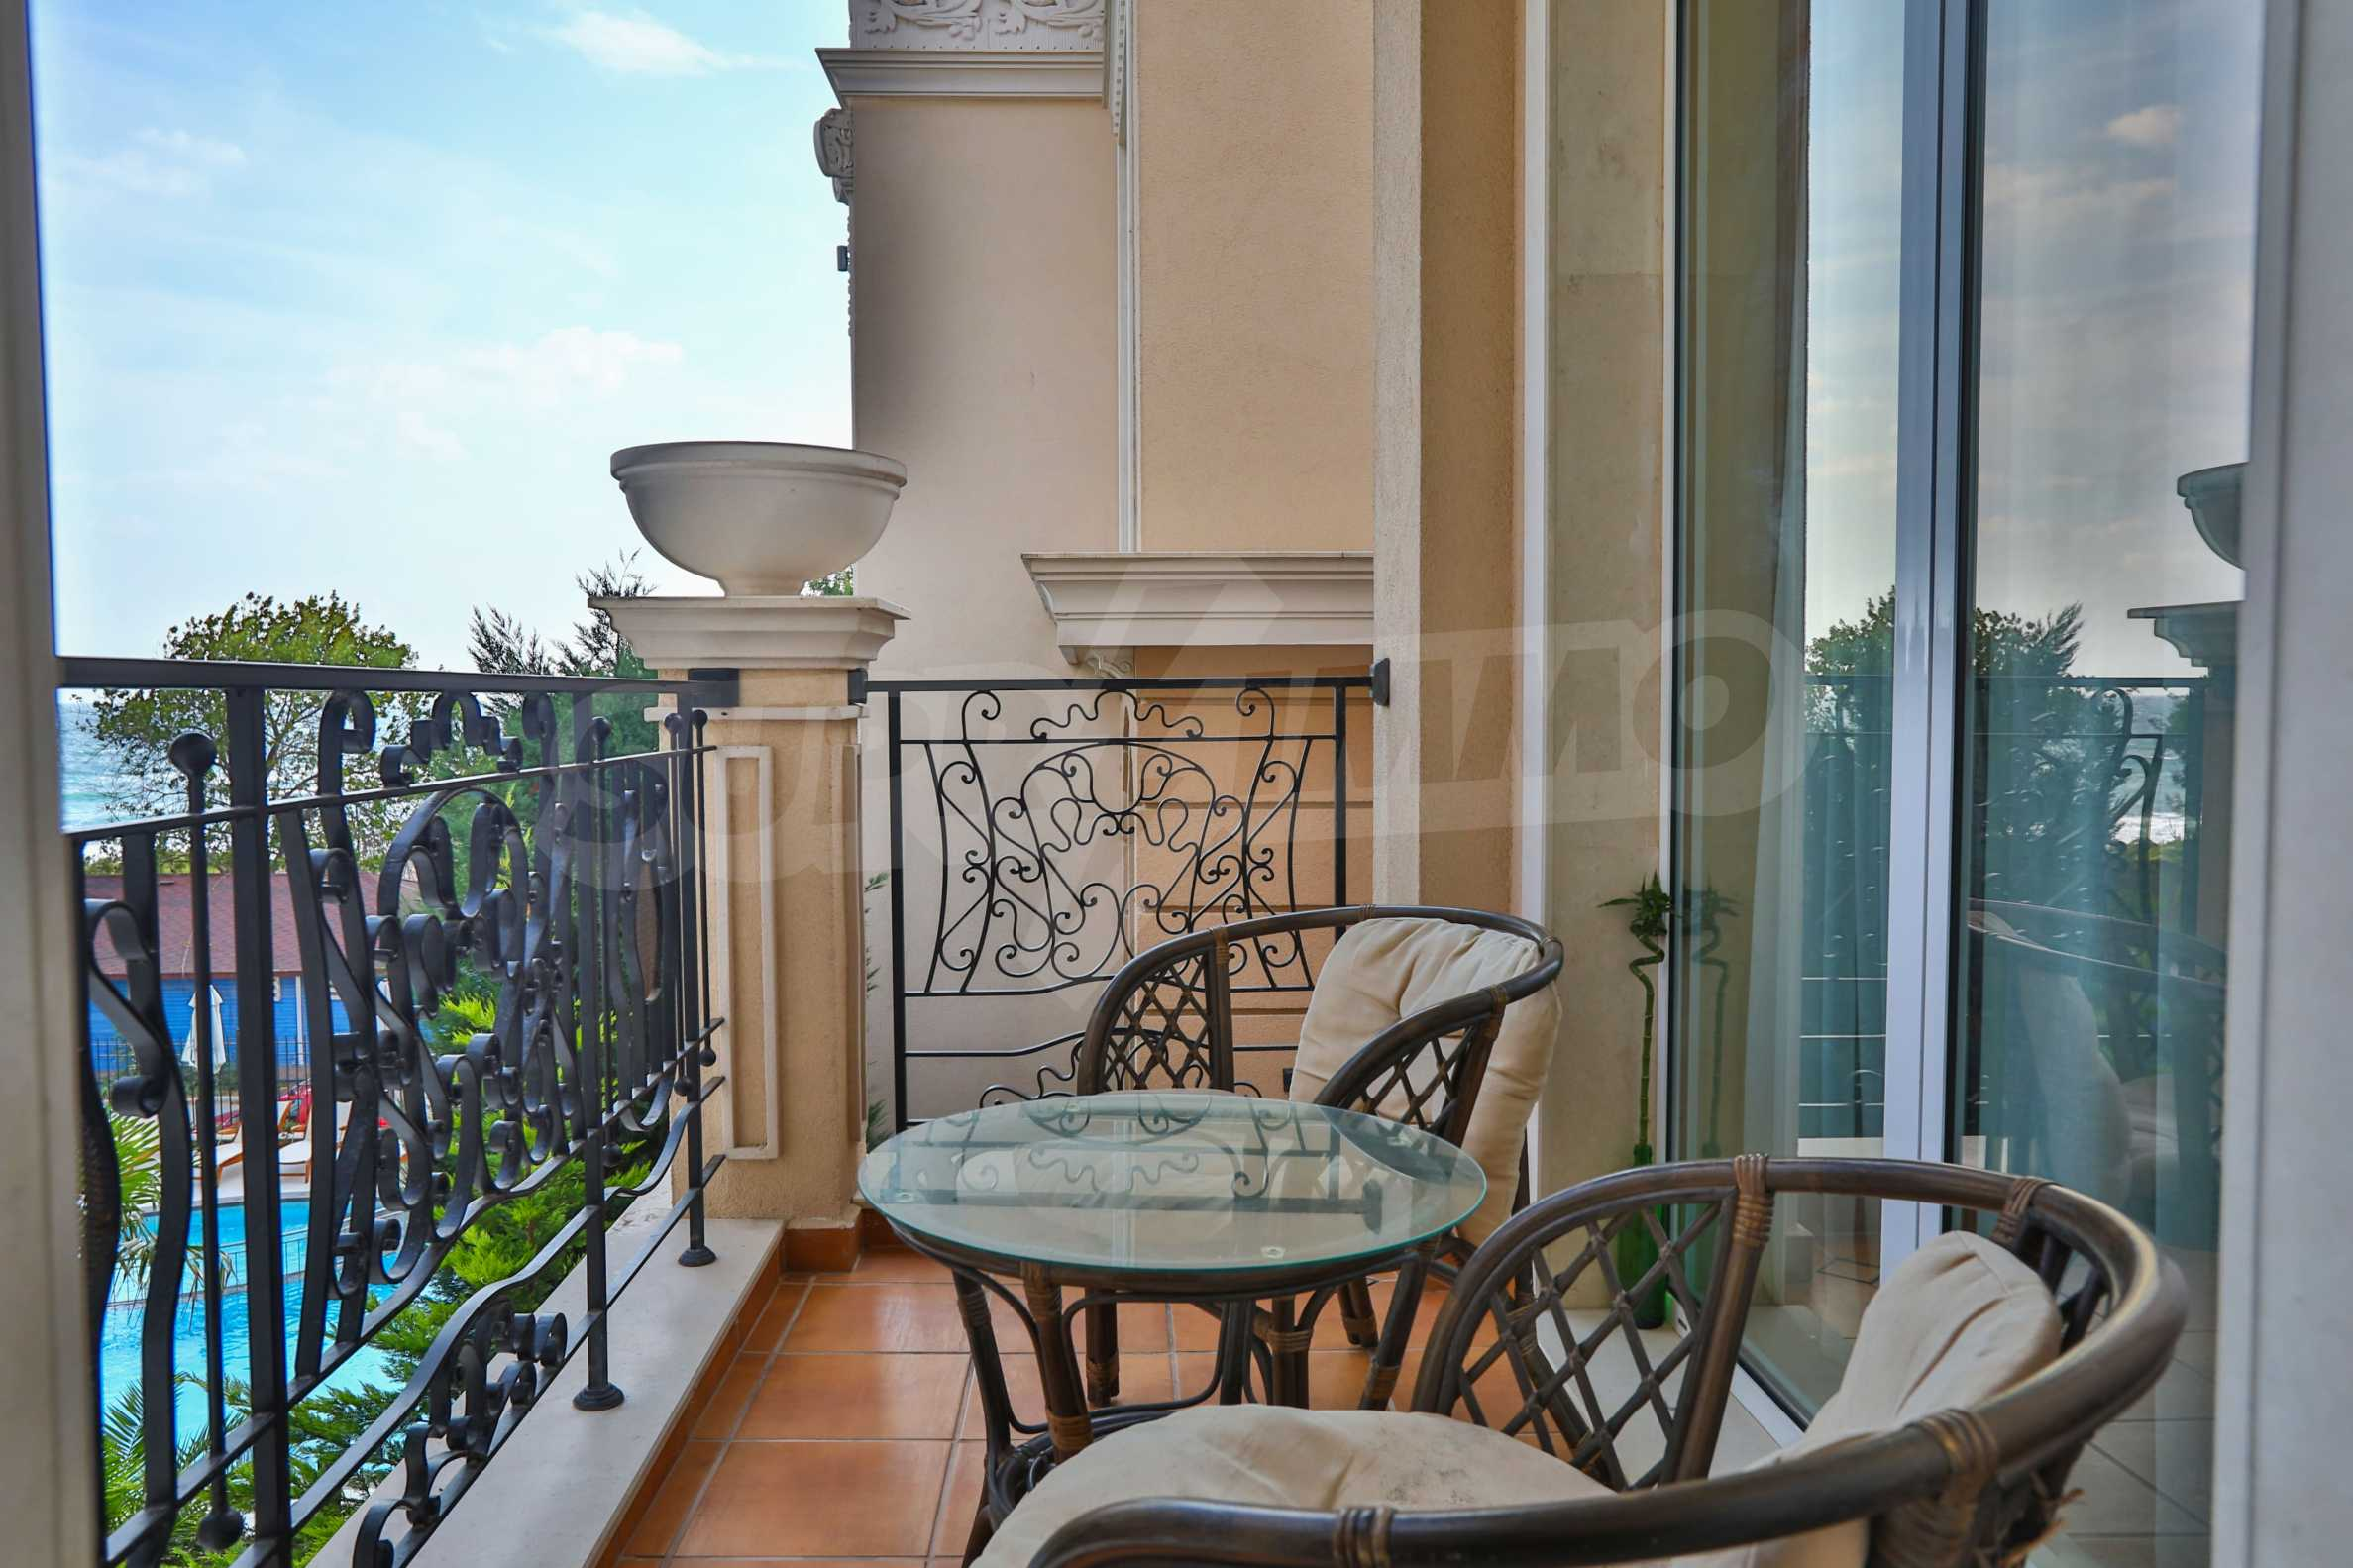 Дизайнерски тристаен апартамент под наем за летен сезон в резиденция Belle Époque в Лозенец 11